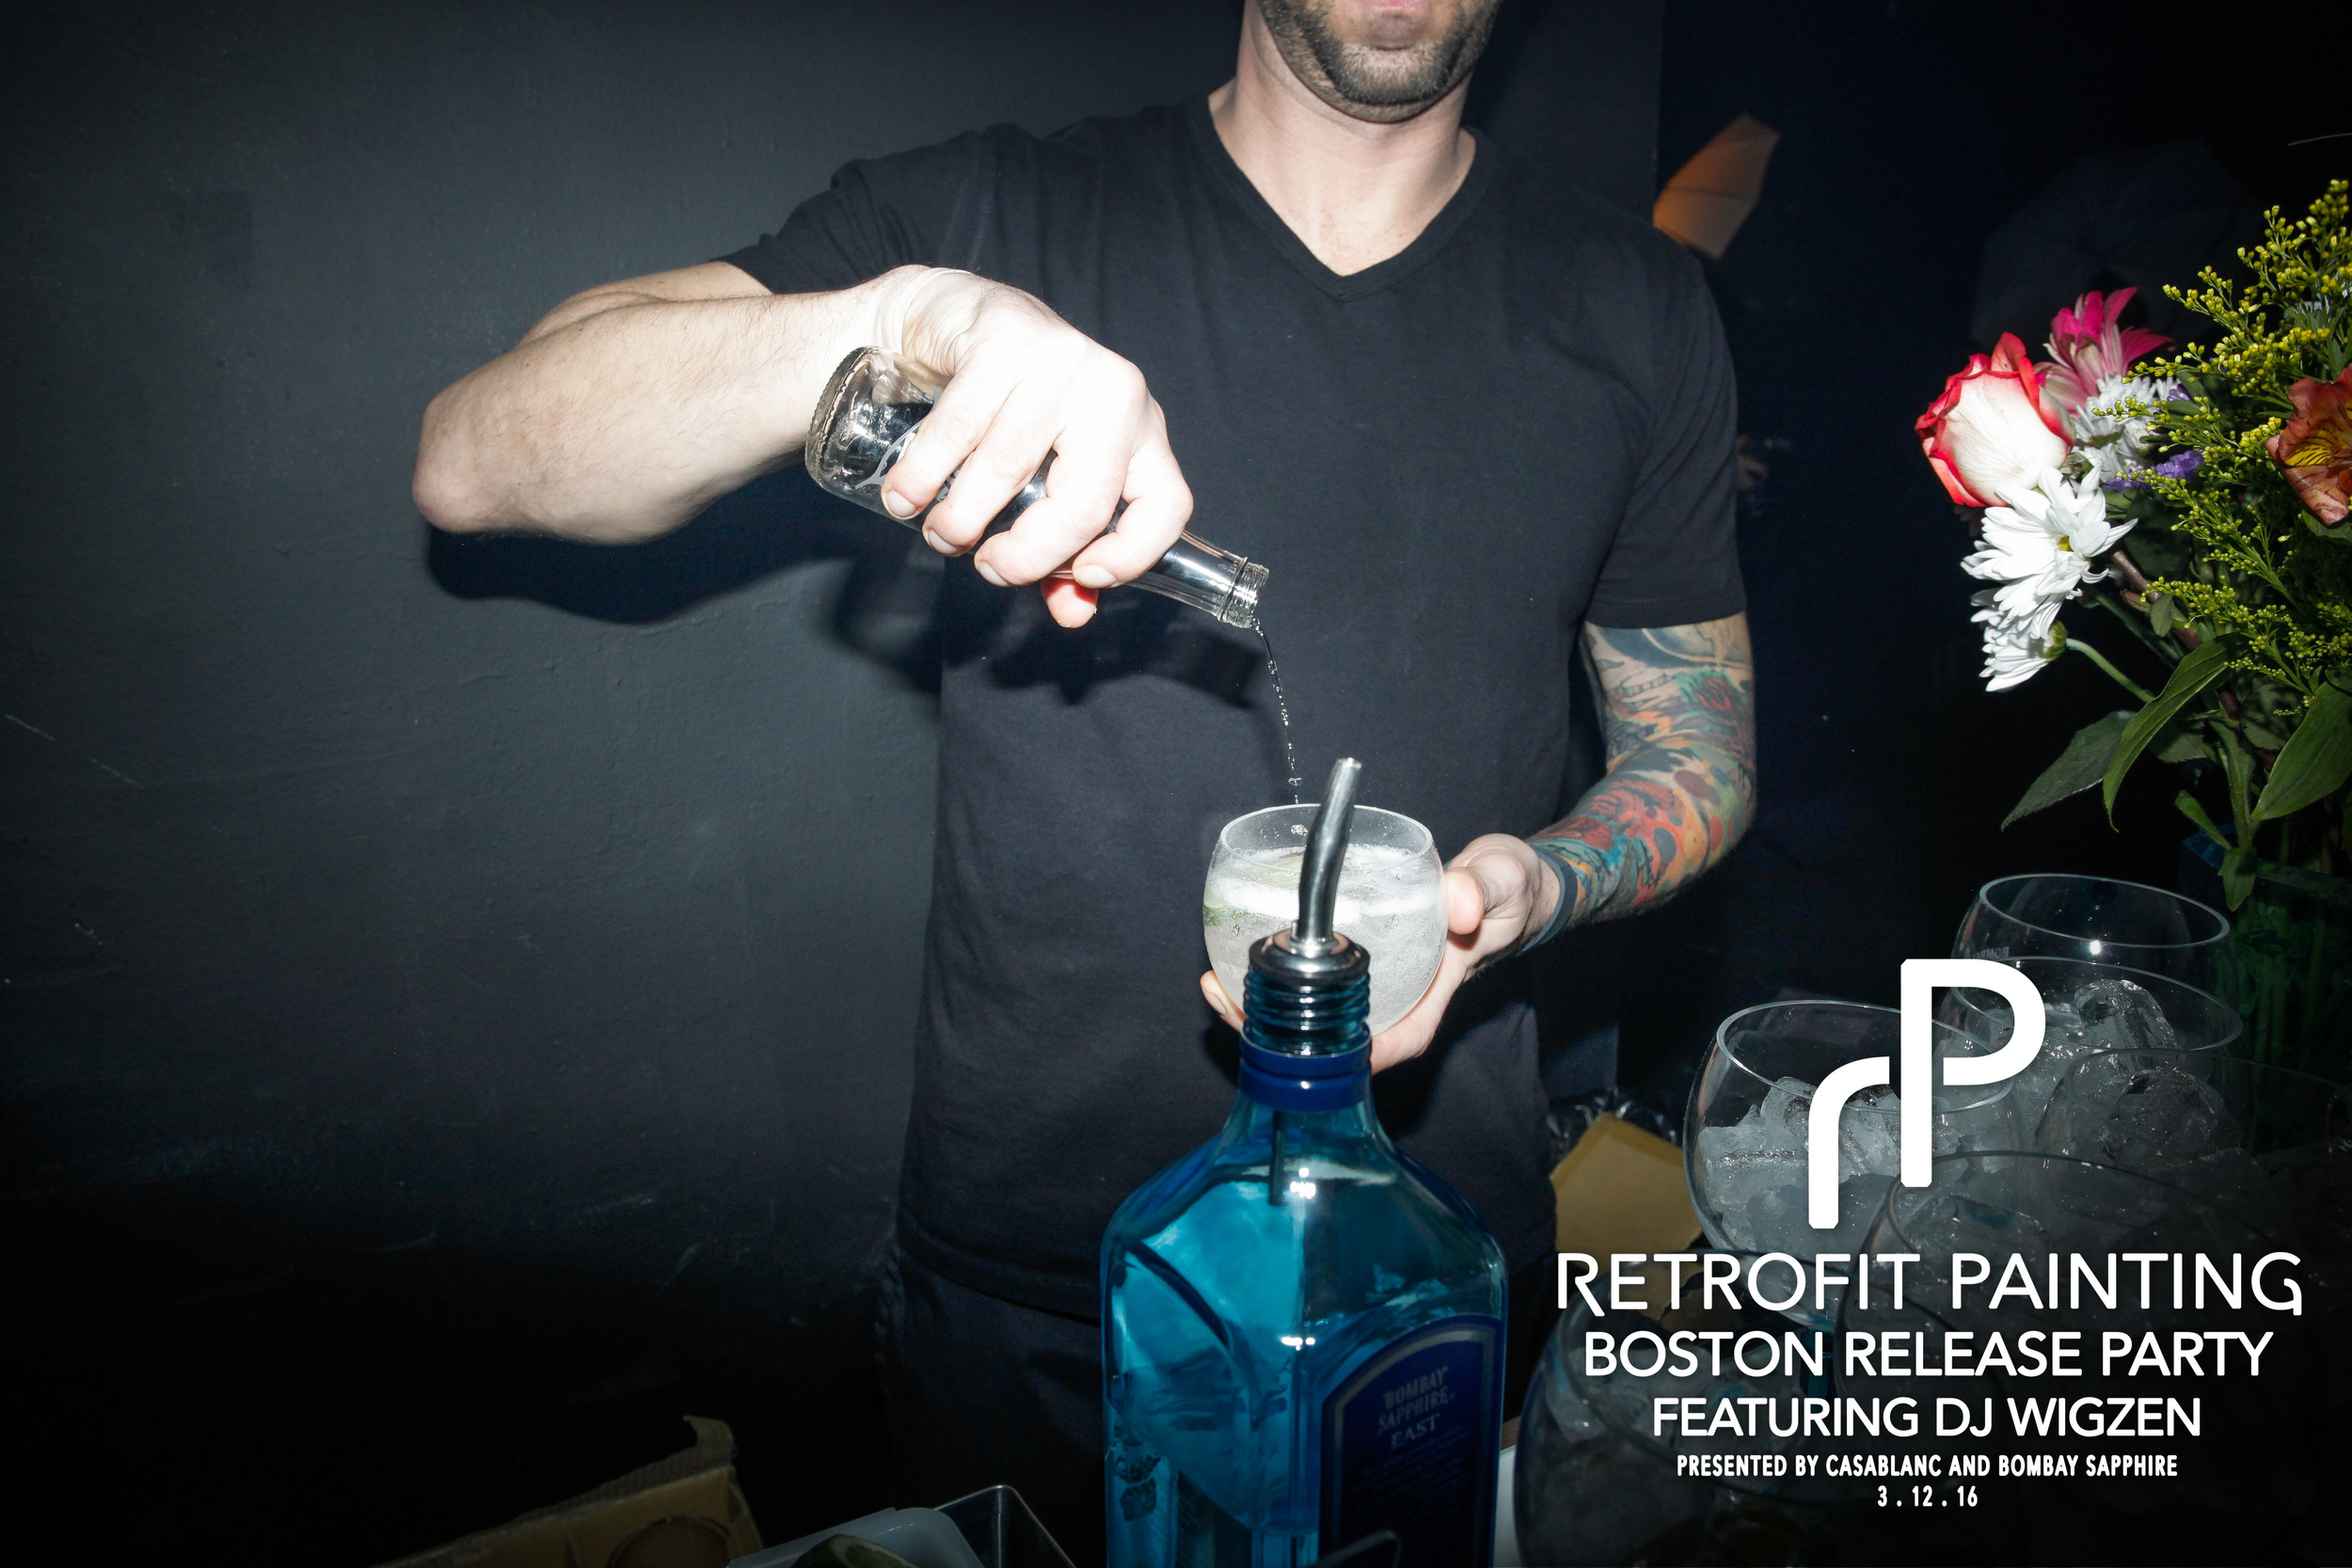 Retrofit Painting Boston Release Party 0065.jpg